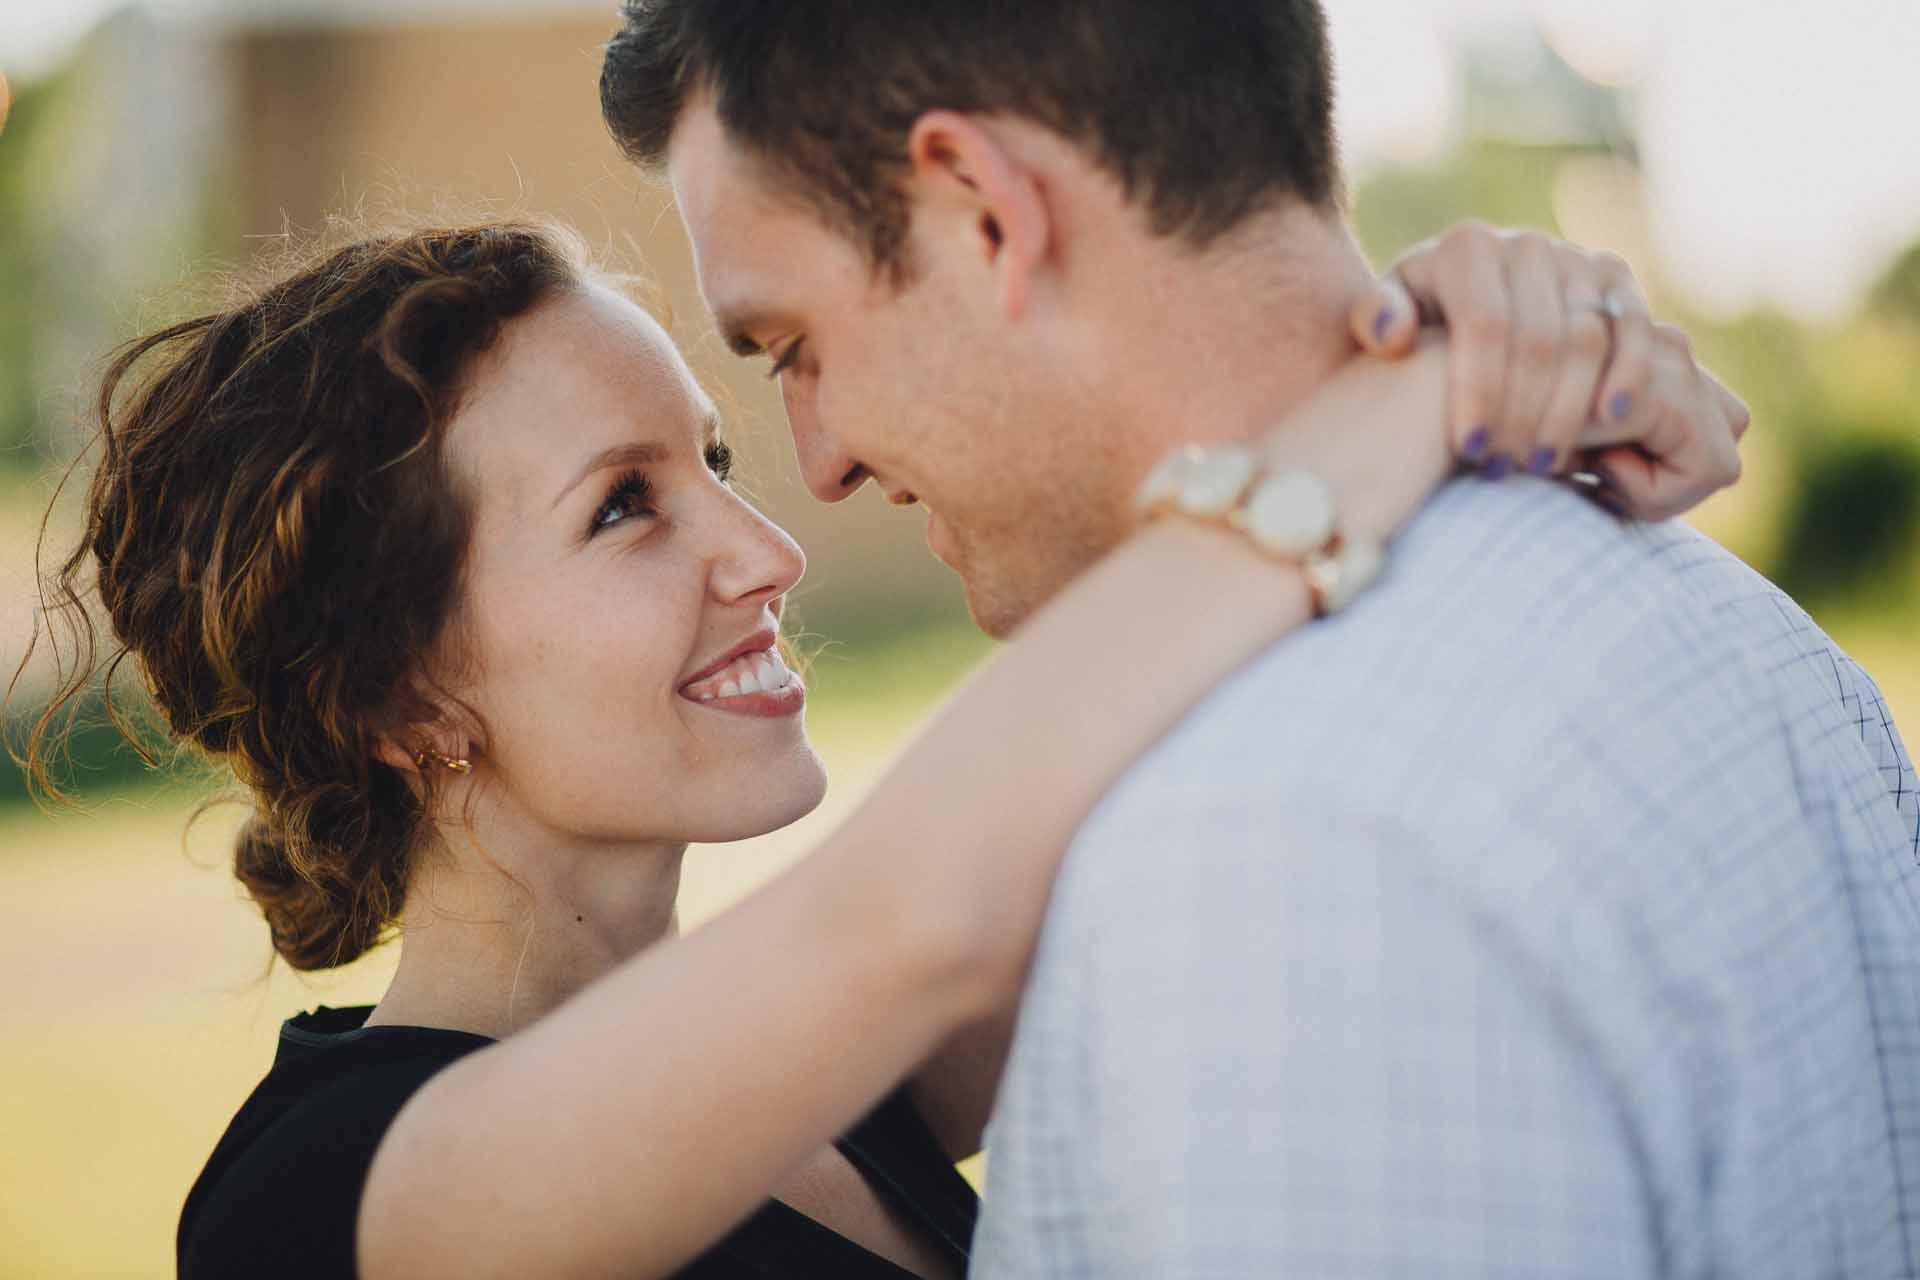 Emily-Dan-Dayton-Engagement-010@2x.jpg